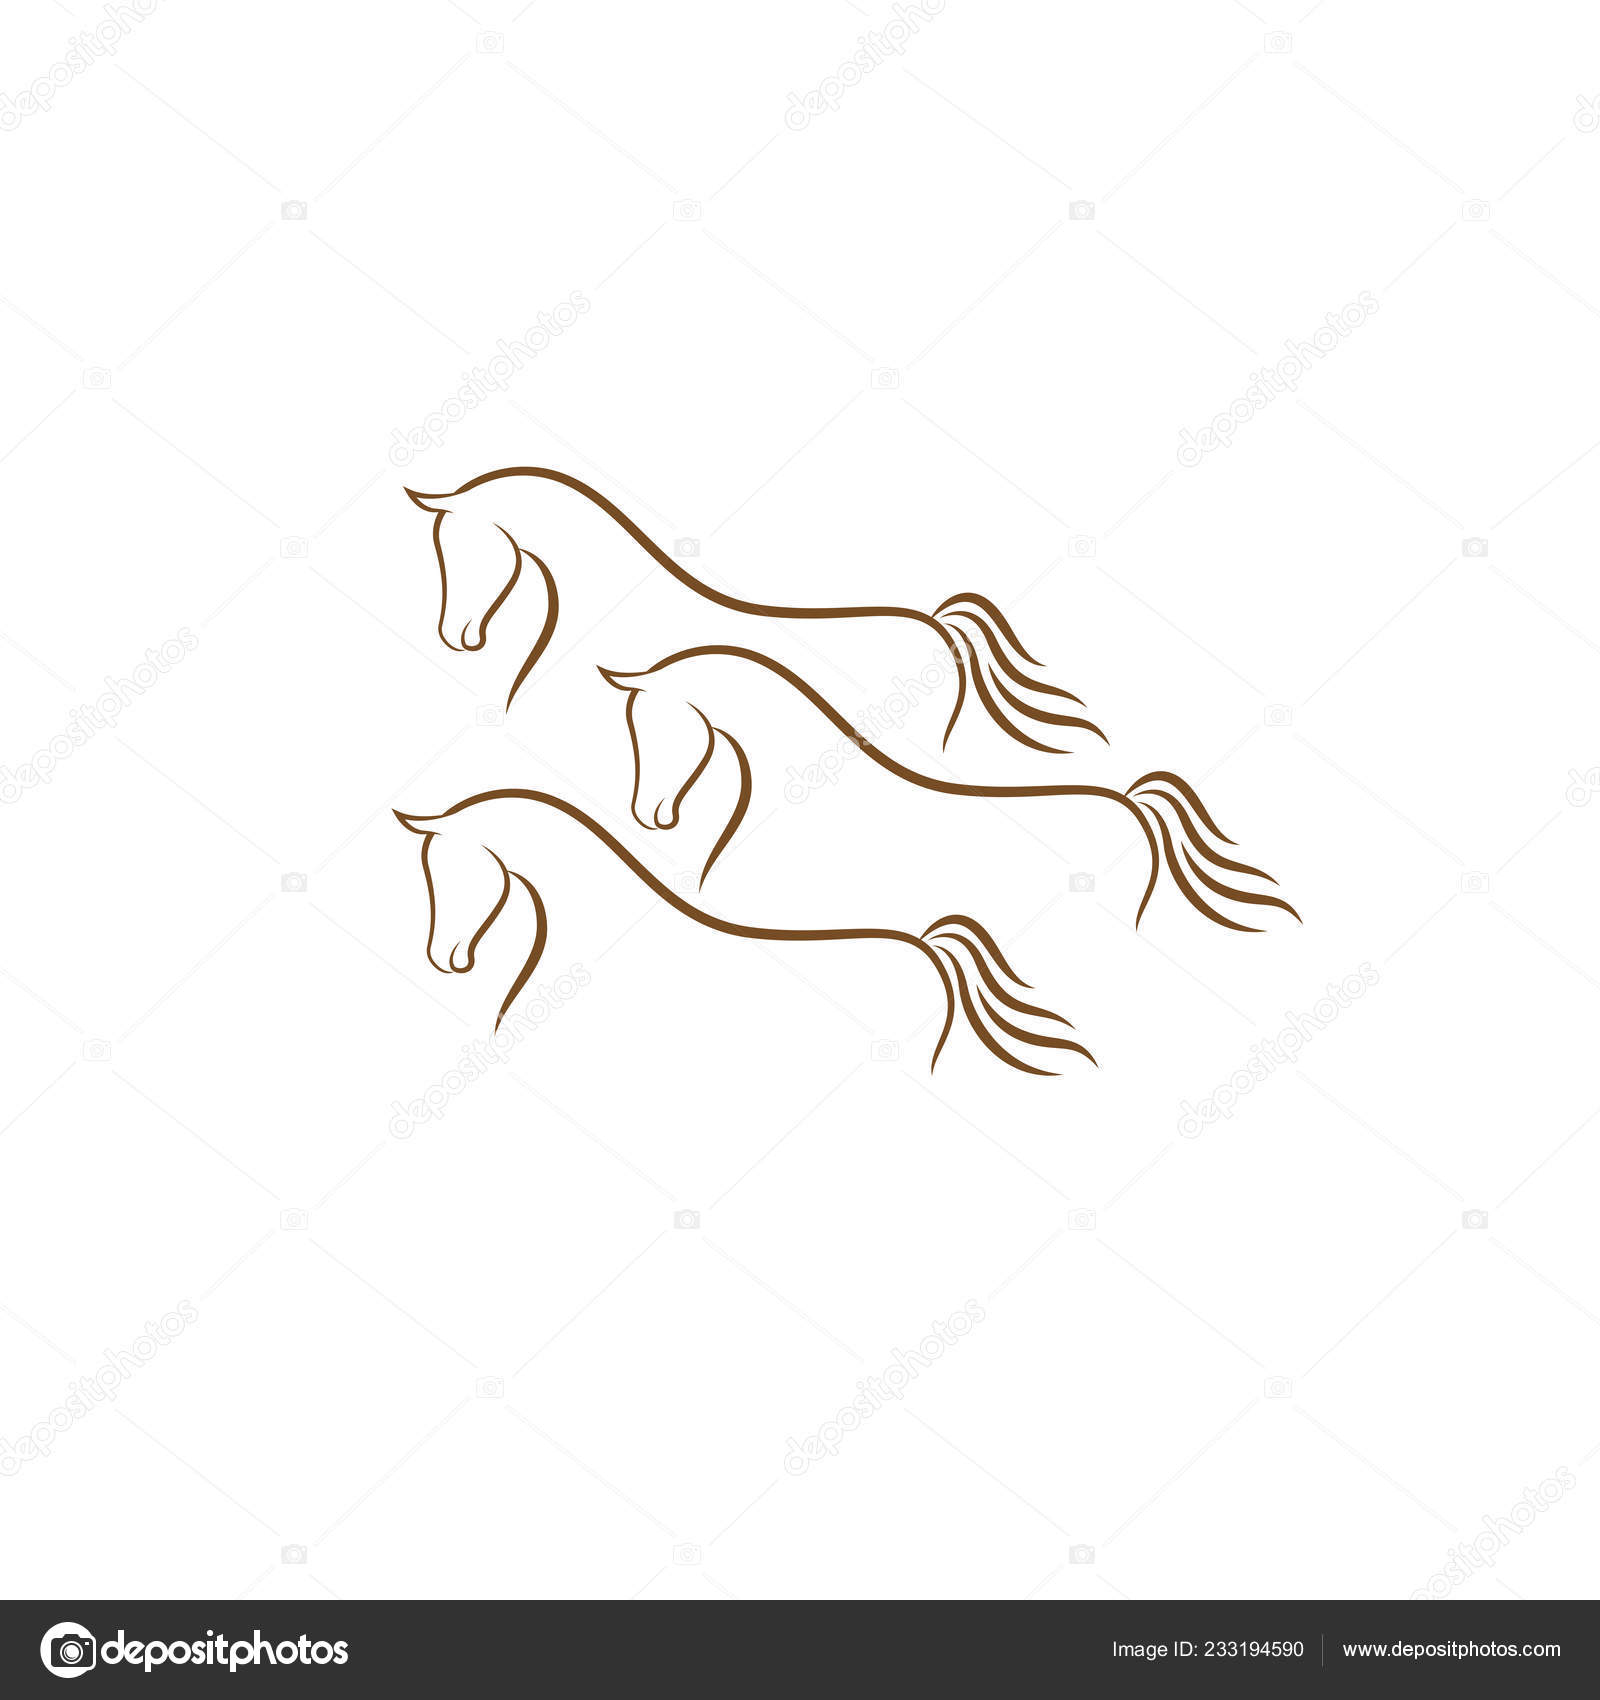 Horse Logo Design Illustration Horse Silhouette Vector Horse Vector Inspiration Stock Vector C Alfianiqbal 233194590